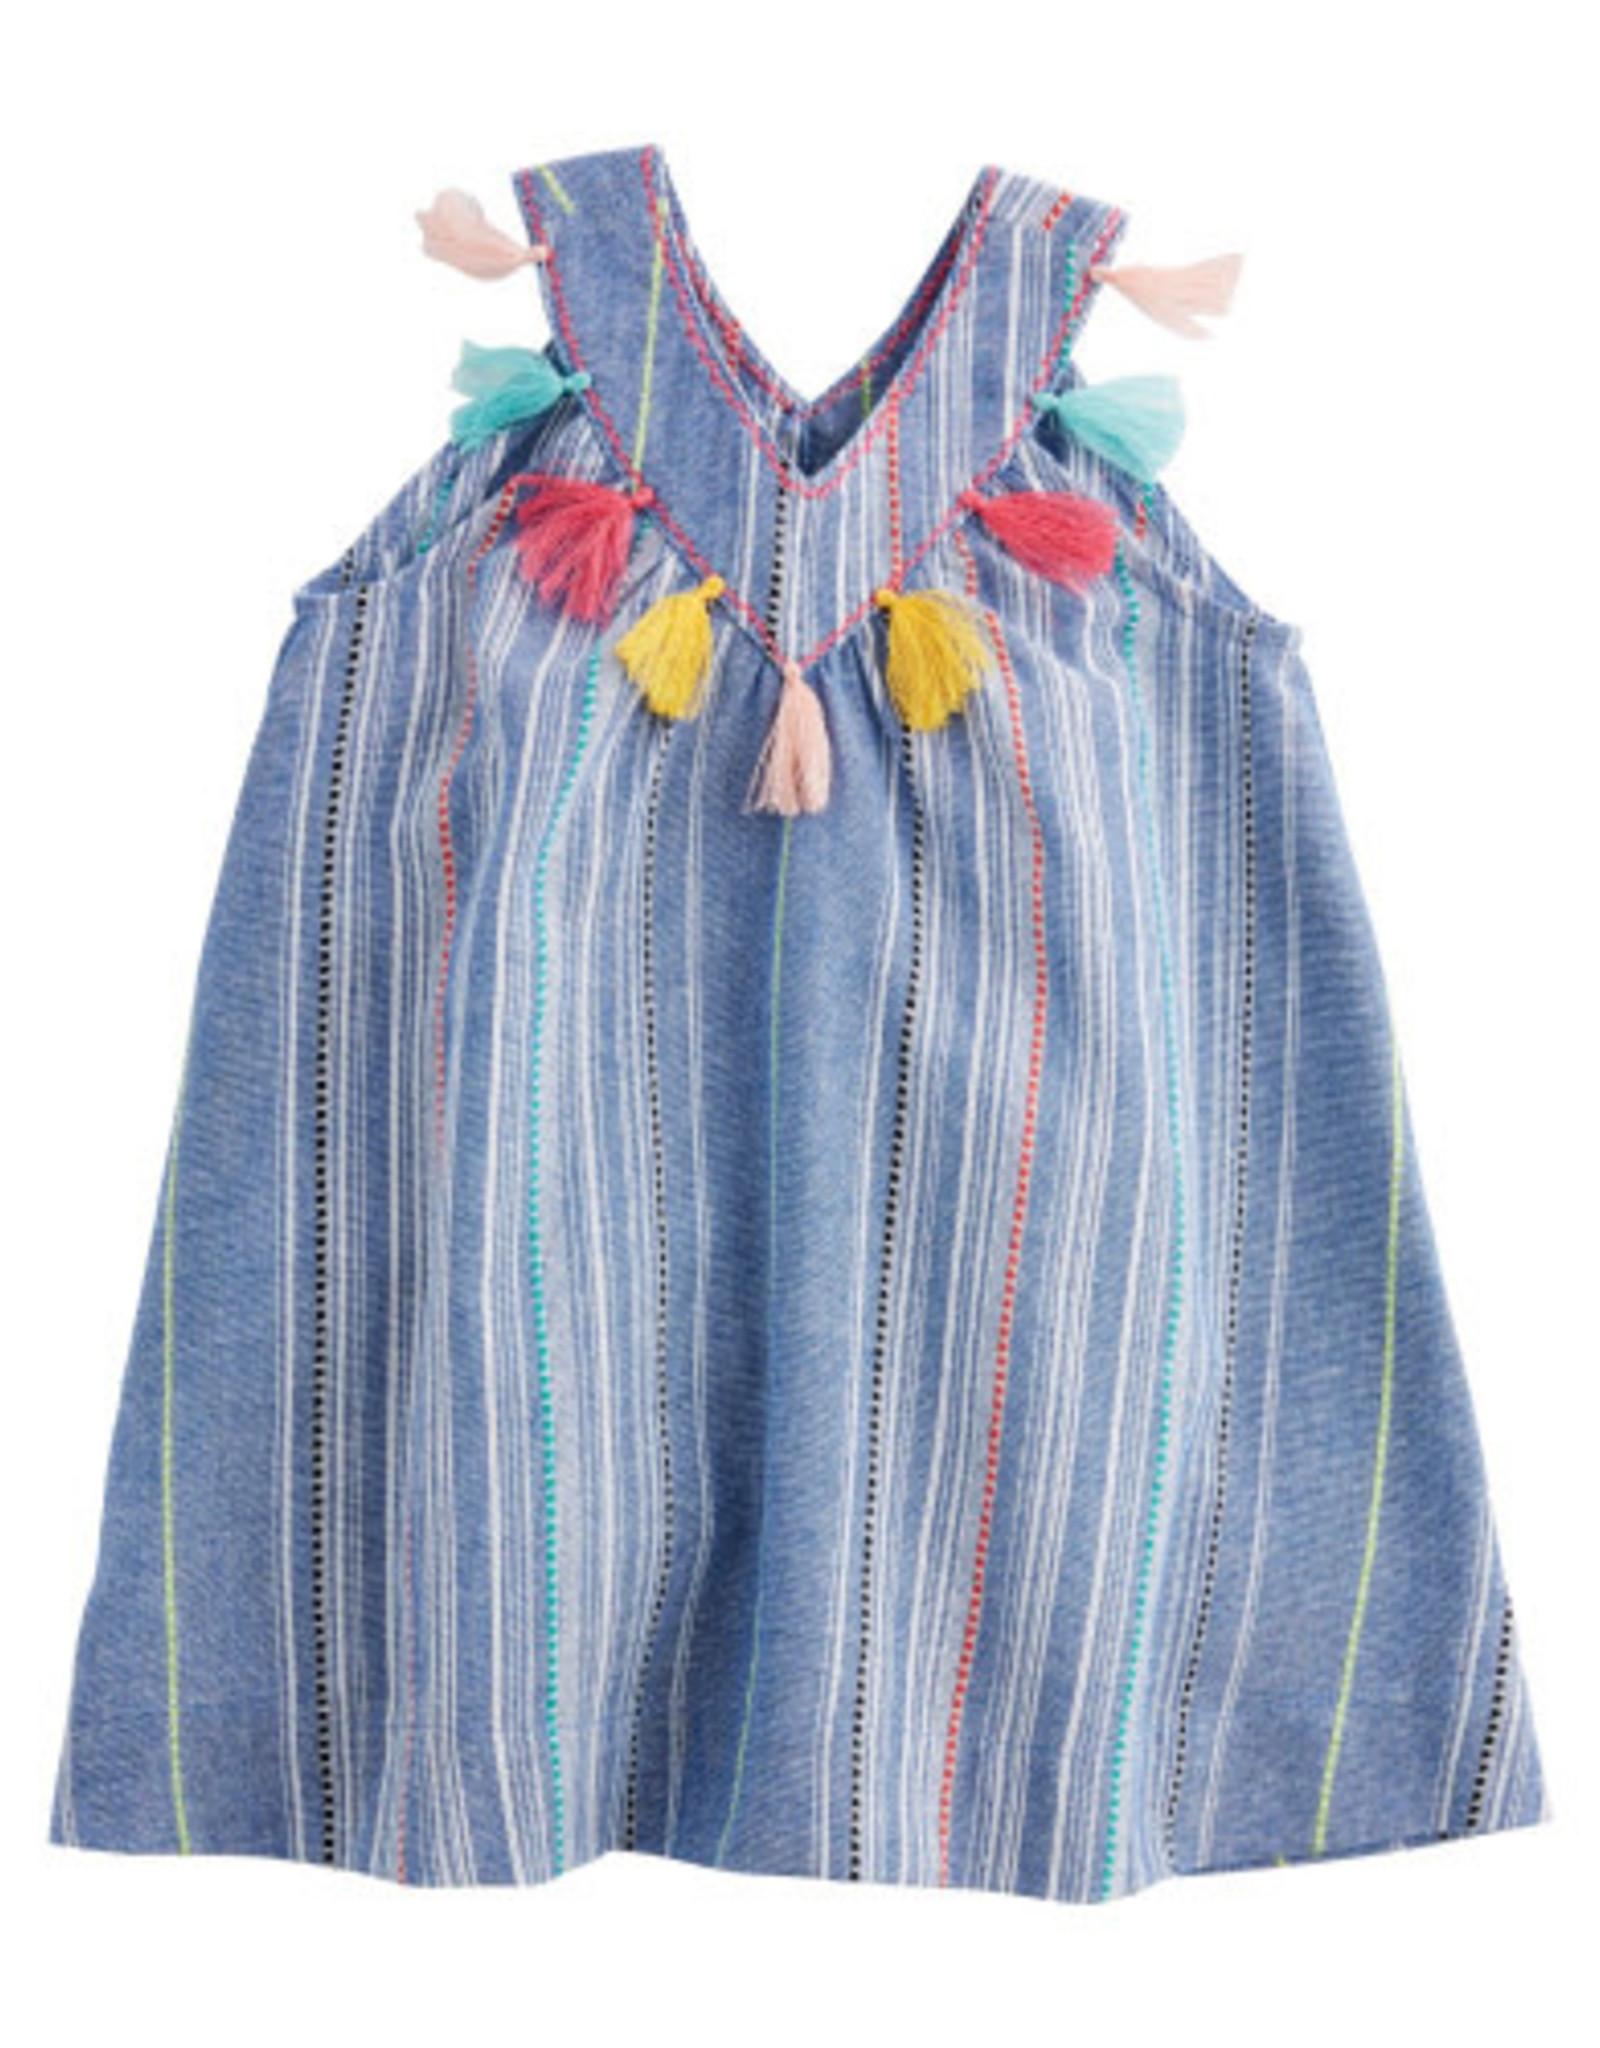 Mud pie Chambray Tassel Dress